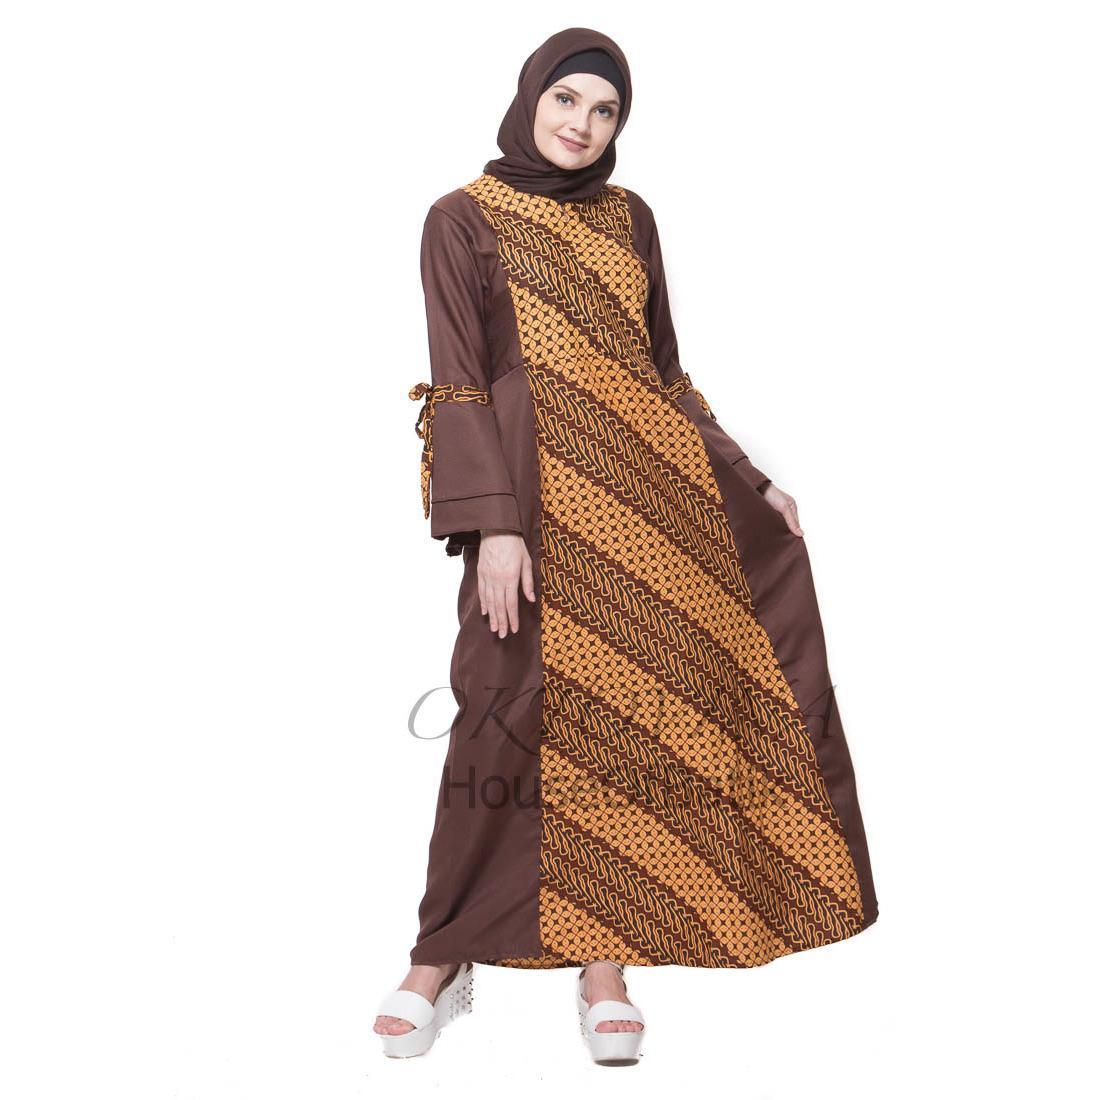 Oktovina-HouseOfBatik Gamis Batik Sogan Katun-Balotelli Parang Kawung - Sogan Batik GBSKB-2 - Cokelat / Gamis Batik / Gamis Wanita / Batik Wanita / Baju Batik